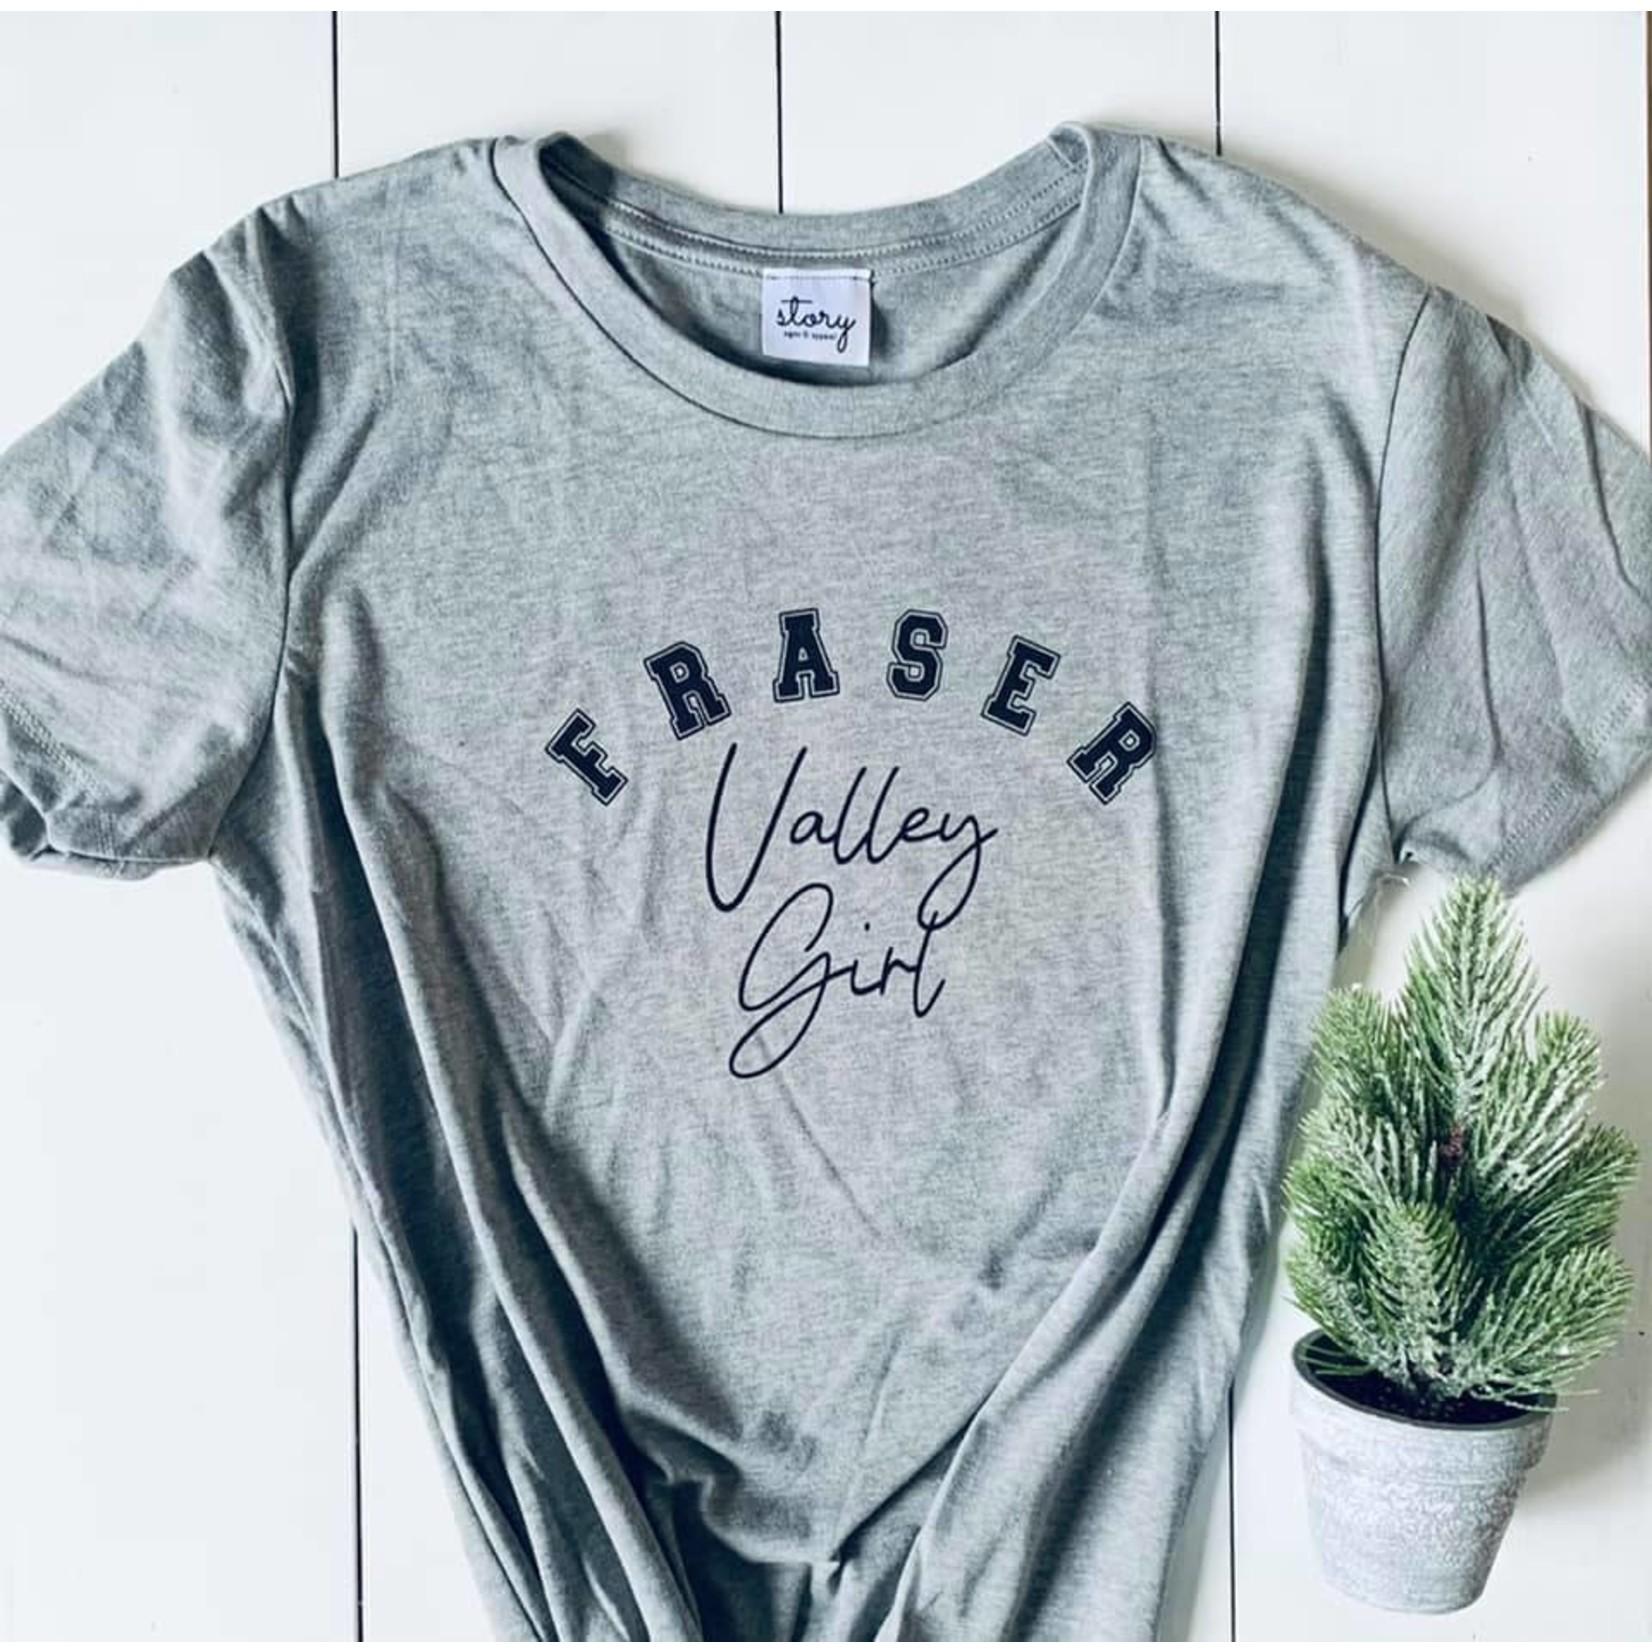 Fraser Valley Girl Tee - Original